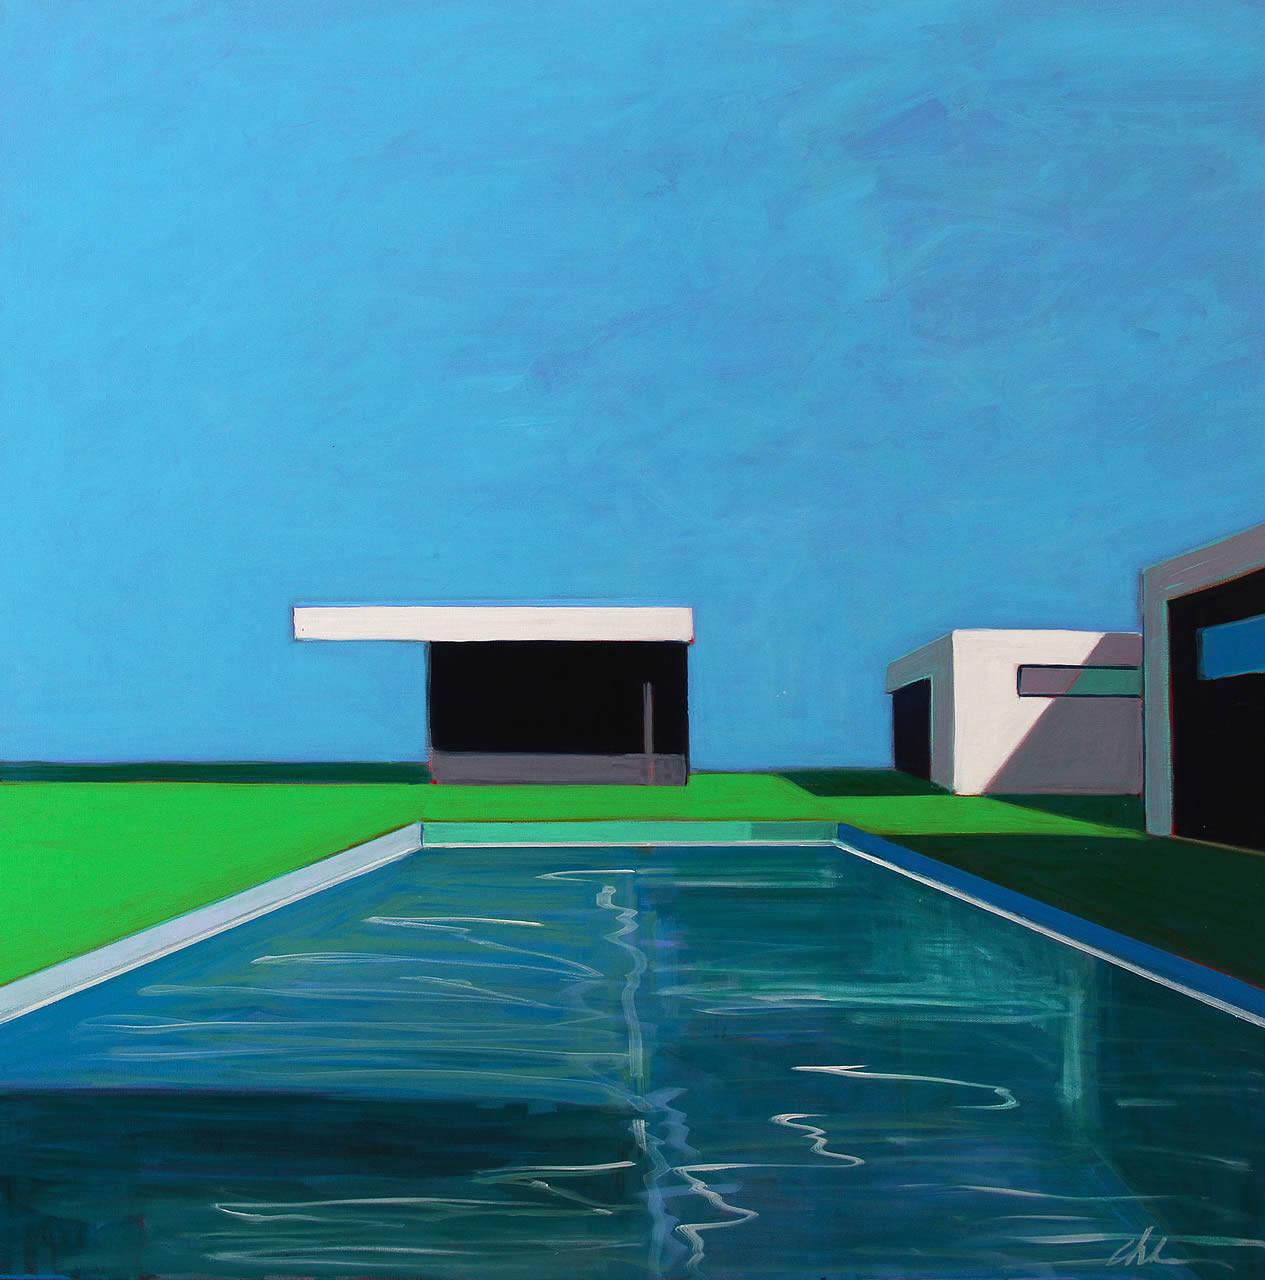 Pool with 3 Modern Buildings